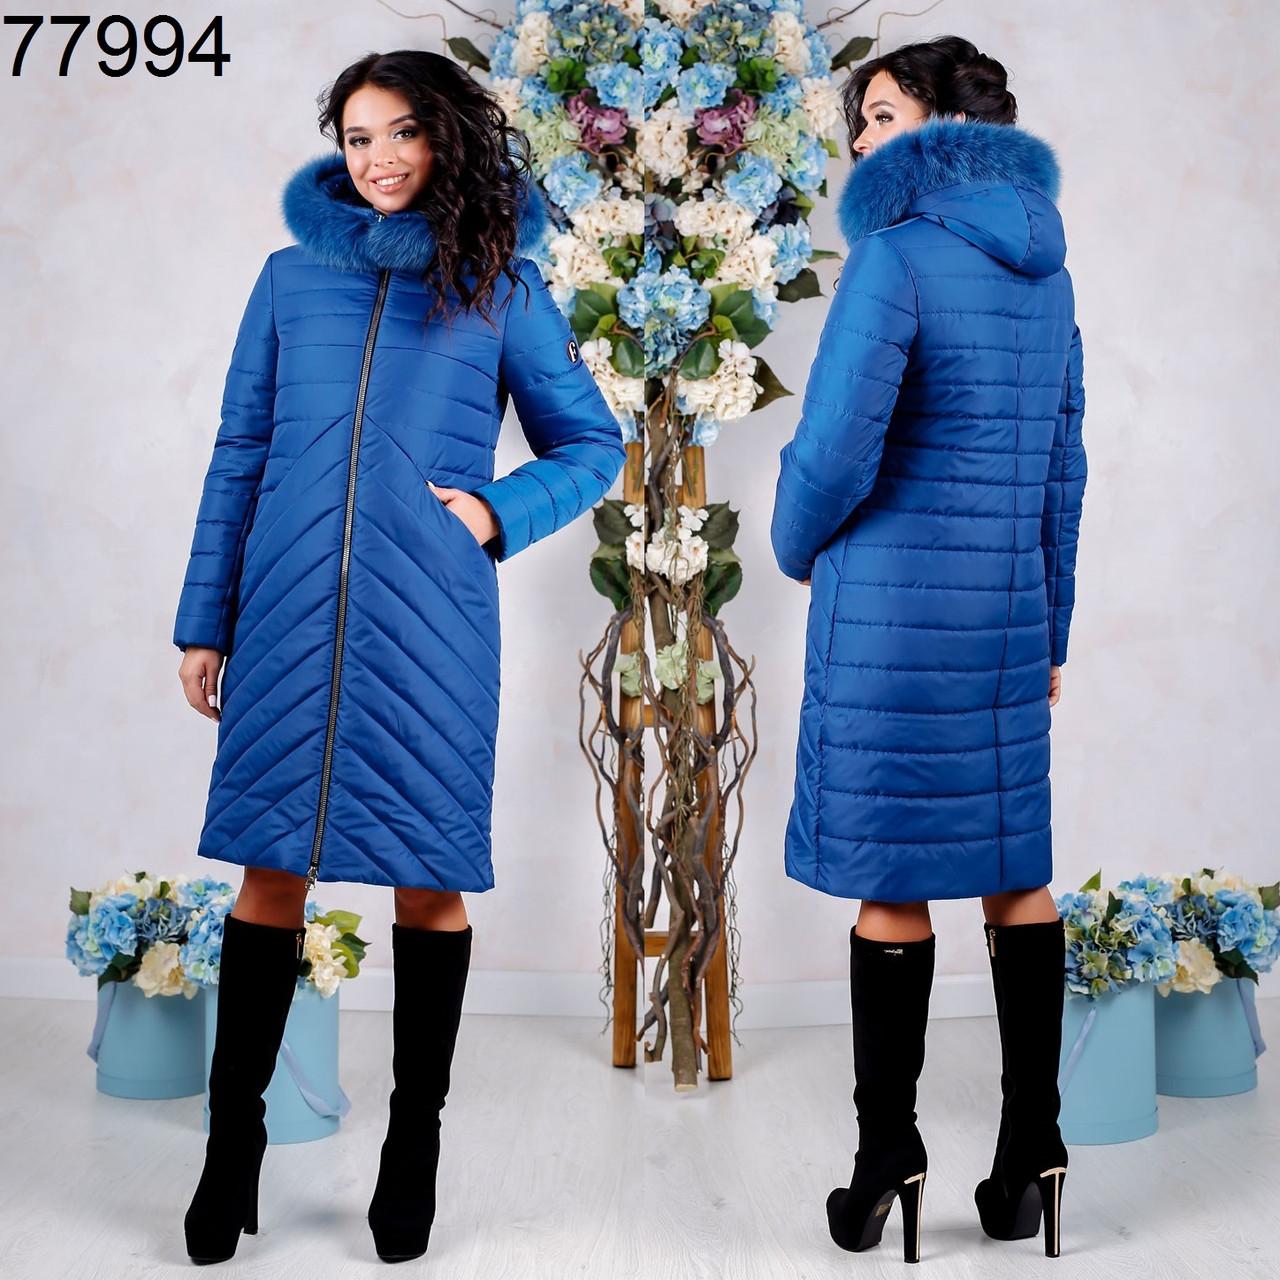 Зимний теплый пуховик  на синтепоне из плащевой ткани  F 77994  Синий